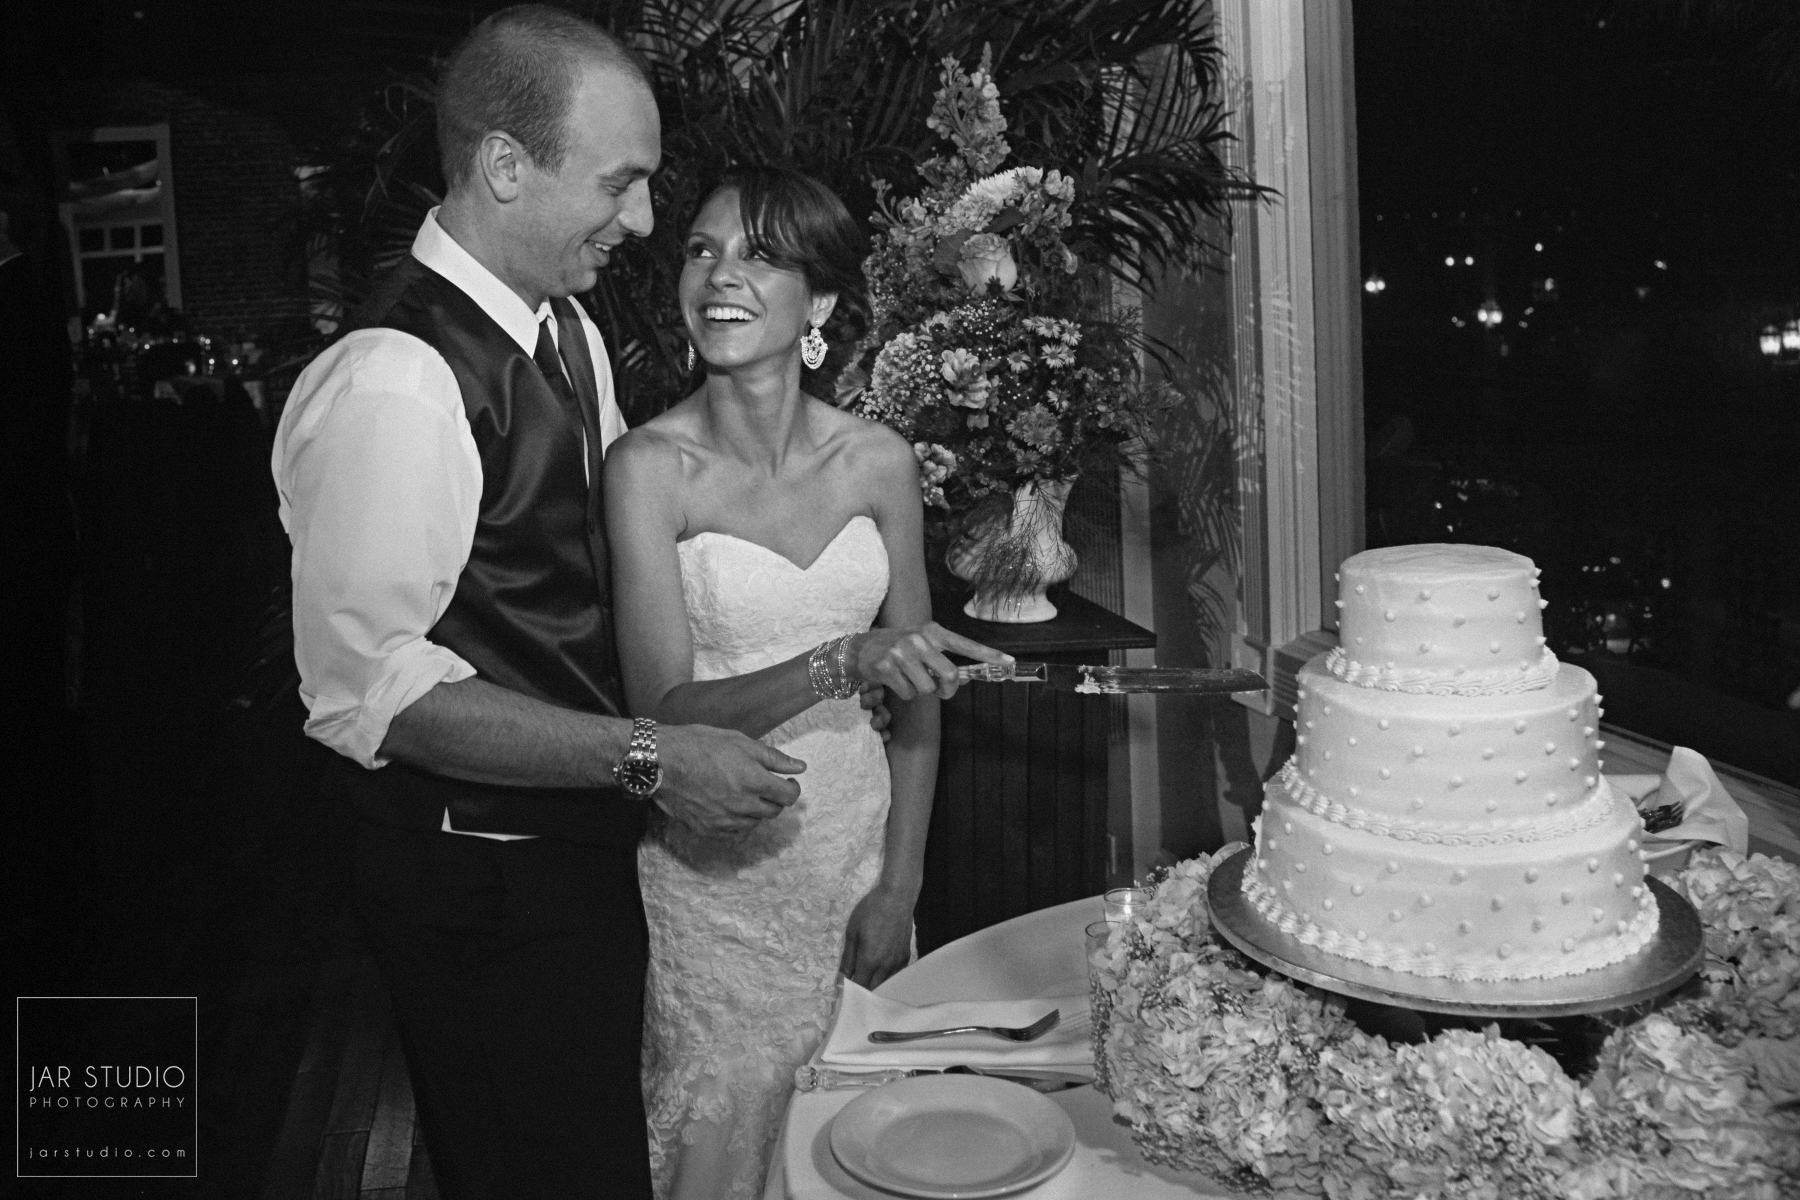 29-wedding-cake-the-grand-ballroom-white-room-jarstudio.JPG